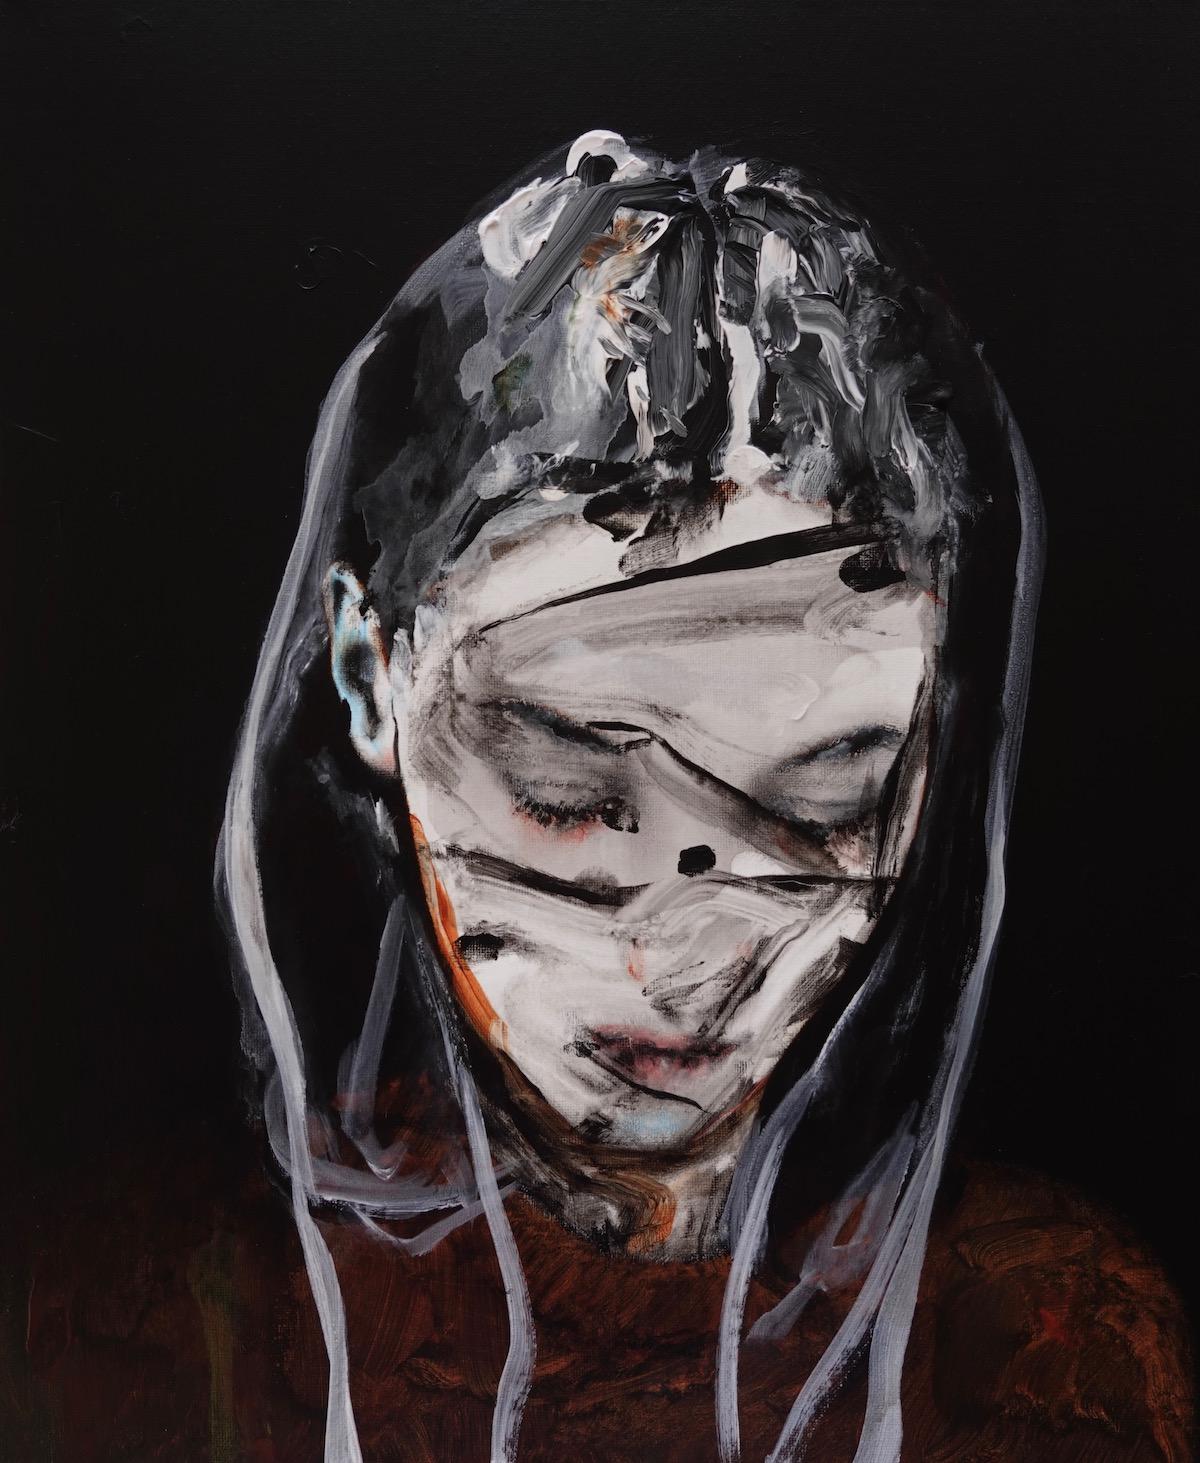 antoine cordet canvas toile peinture painting portrait art artist artiste peintre acrylic oil penny black